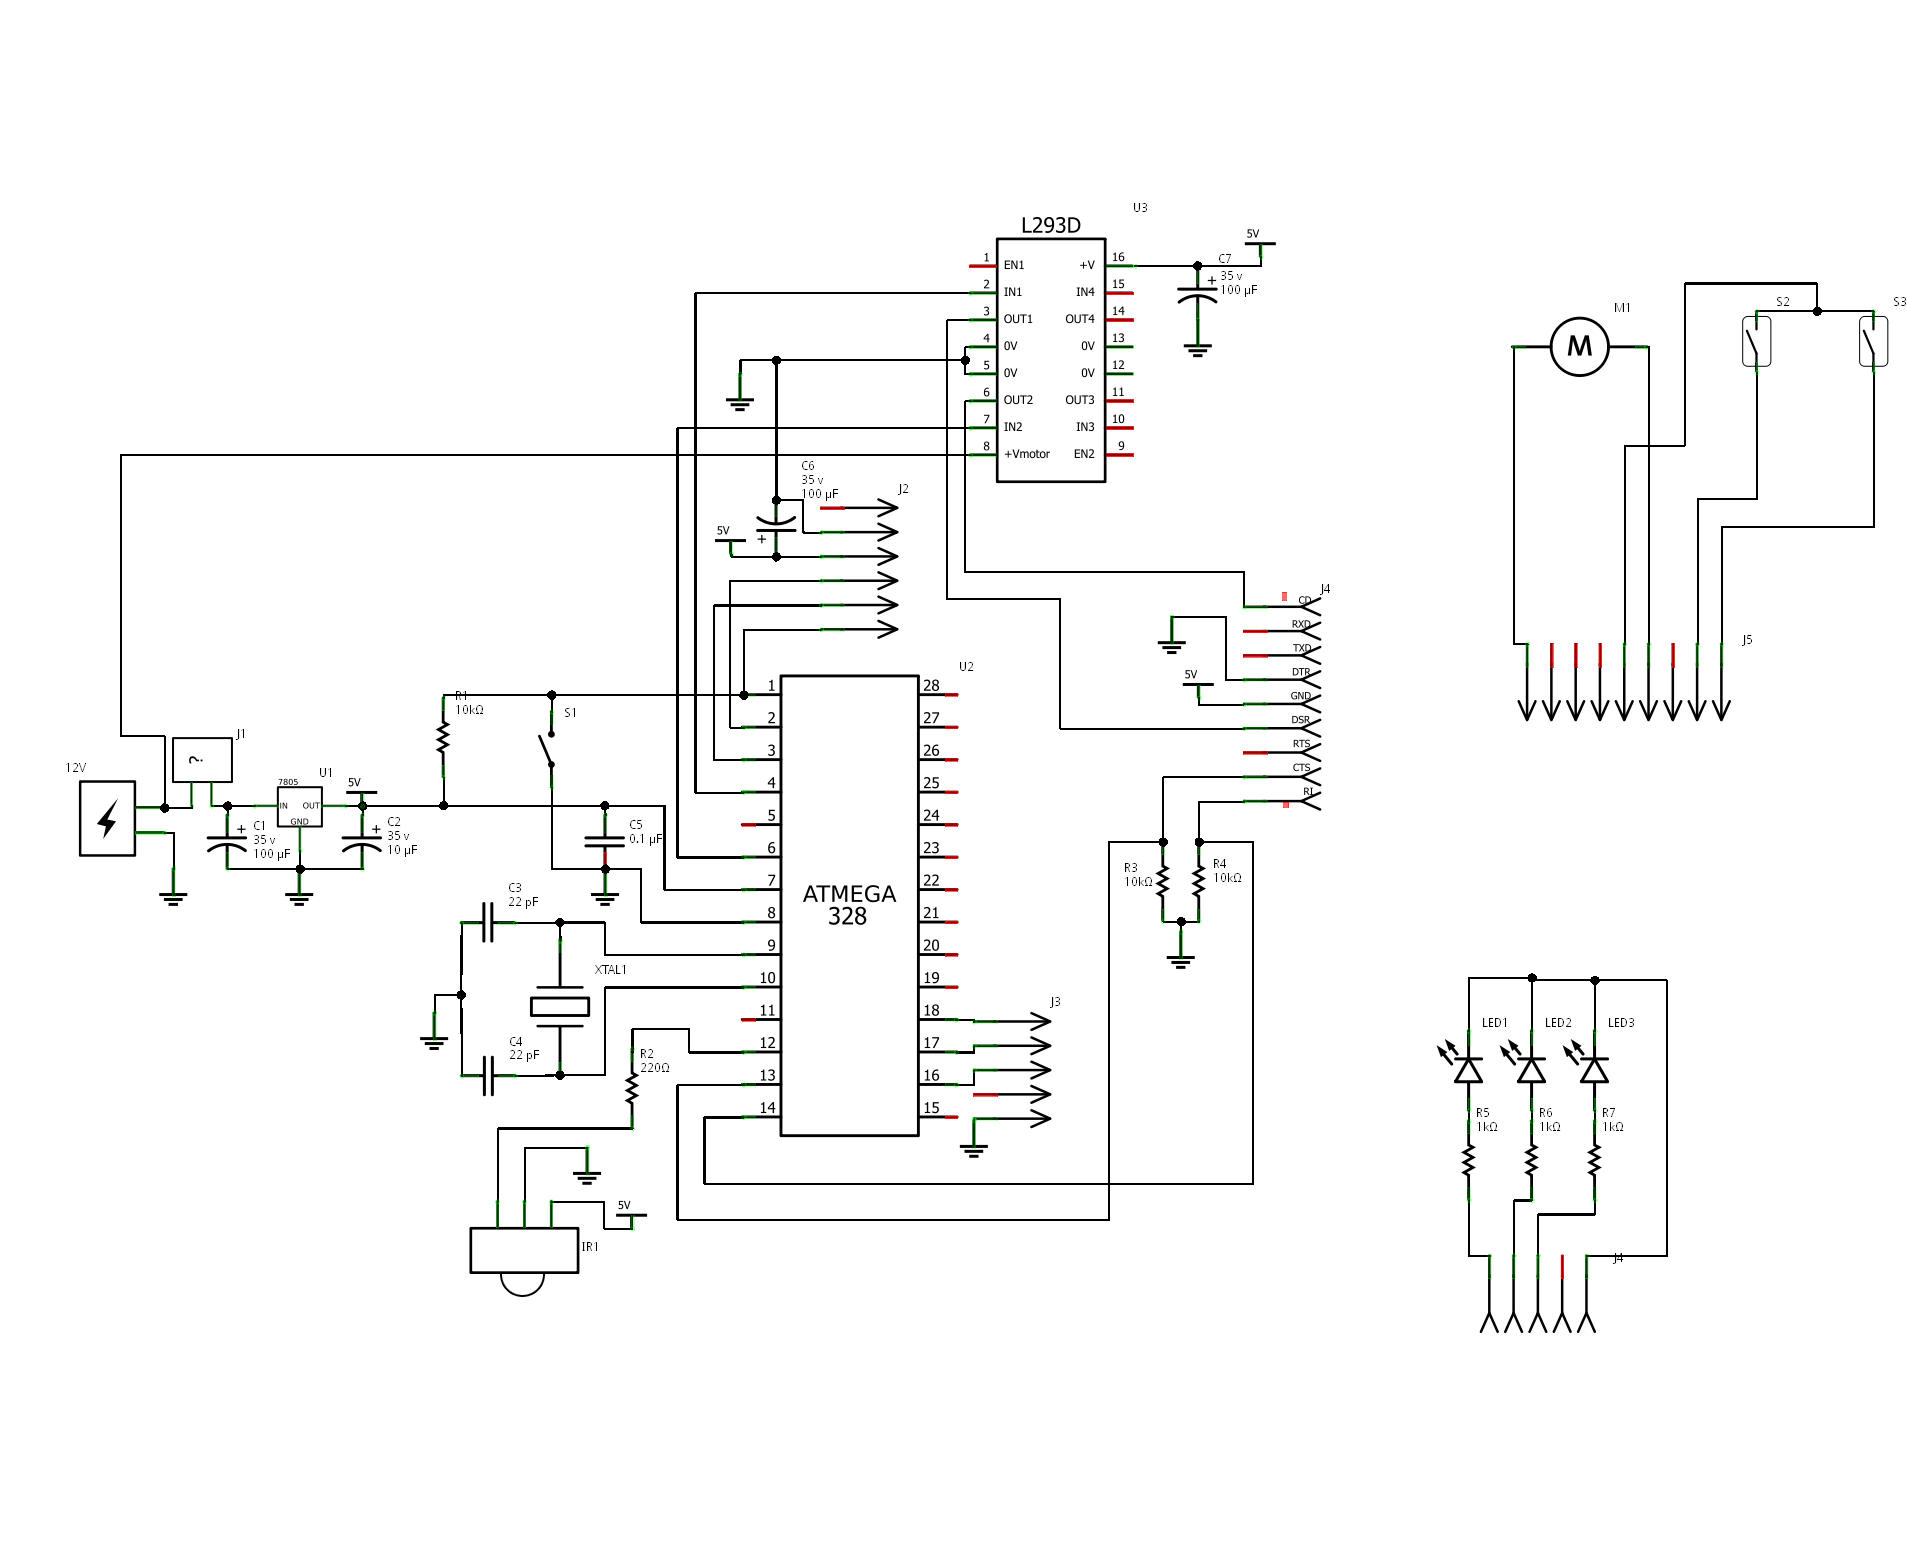 curtain control circuit